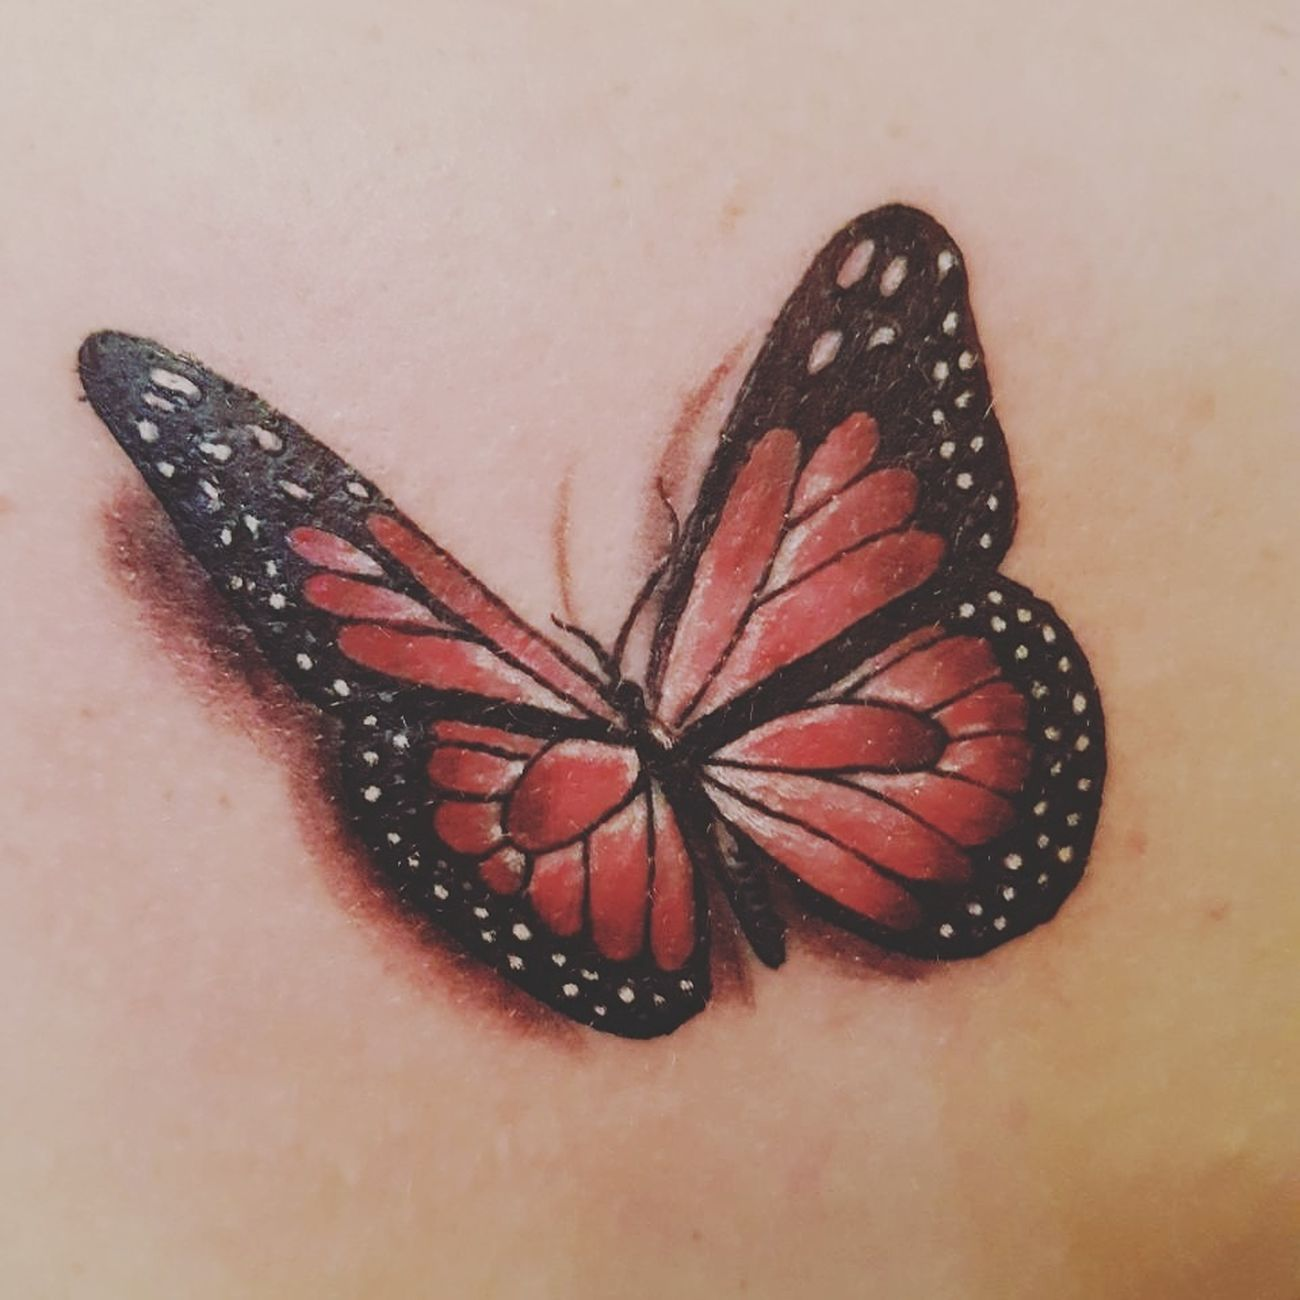 Tattoo Artist Tattoo ❤ Işler GüçleR Bostancı Dovme Suadiyesahil Uygun Fiyata Dövme Yapılır Human Body Part One Woman Only Indirim Tattoolovers Instagram Anadoluyakası Dövmesanatı Bostancida Kadıköyistanbul Tattoolowe Pigmenttaatoo